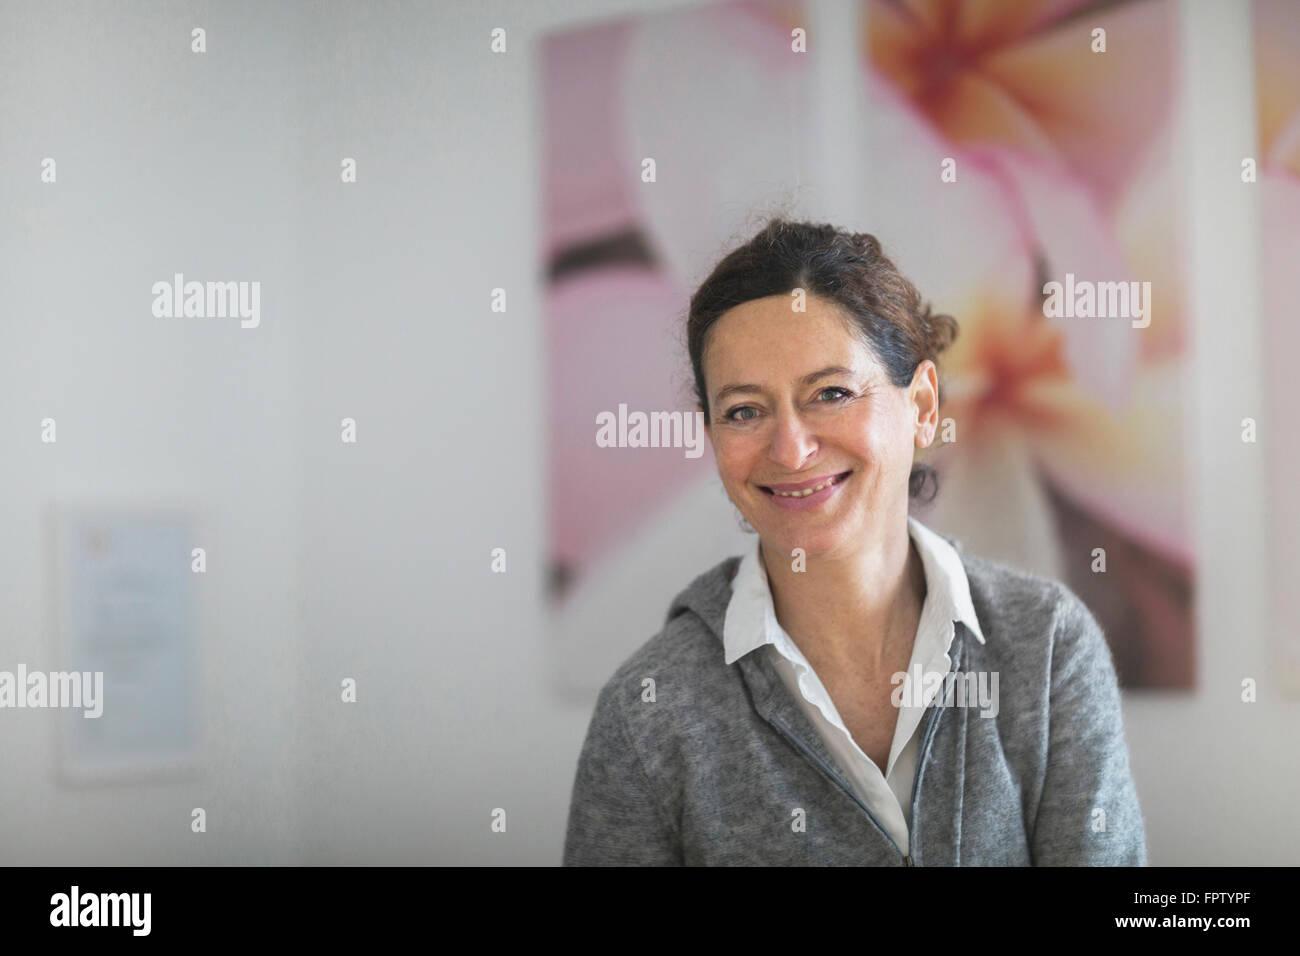 Portrait of a female physiotherapist smiling, Freiburg Im Breisgau, Baden-Württemberg, Germany - Stock Image